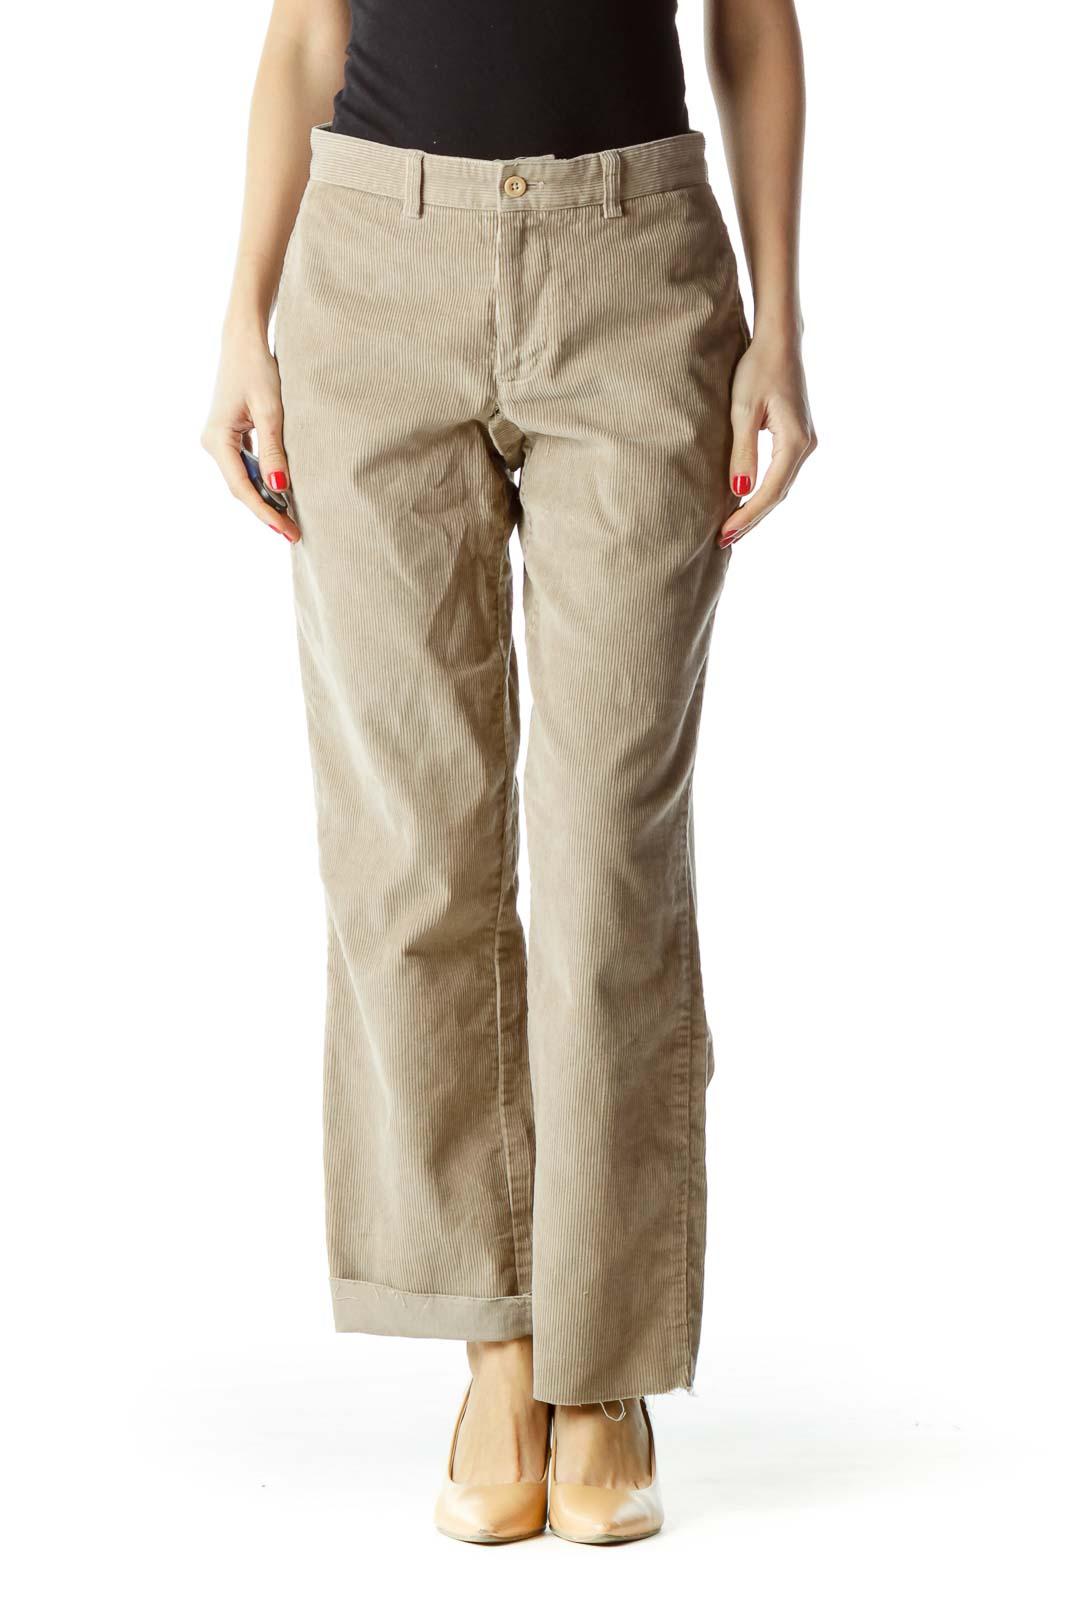 Beige Corduroy 7/8 Pants